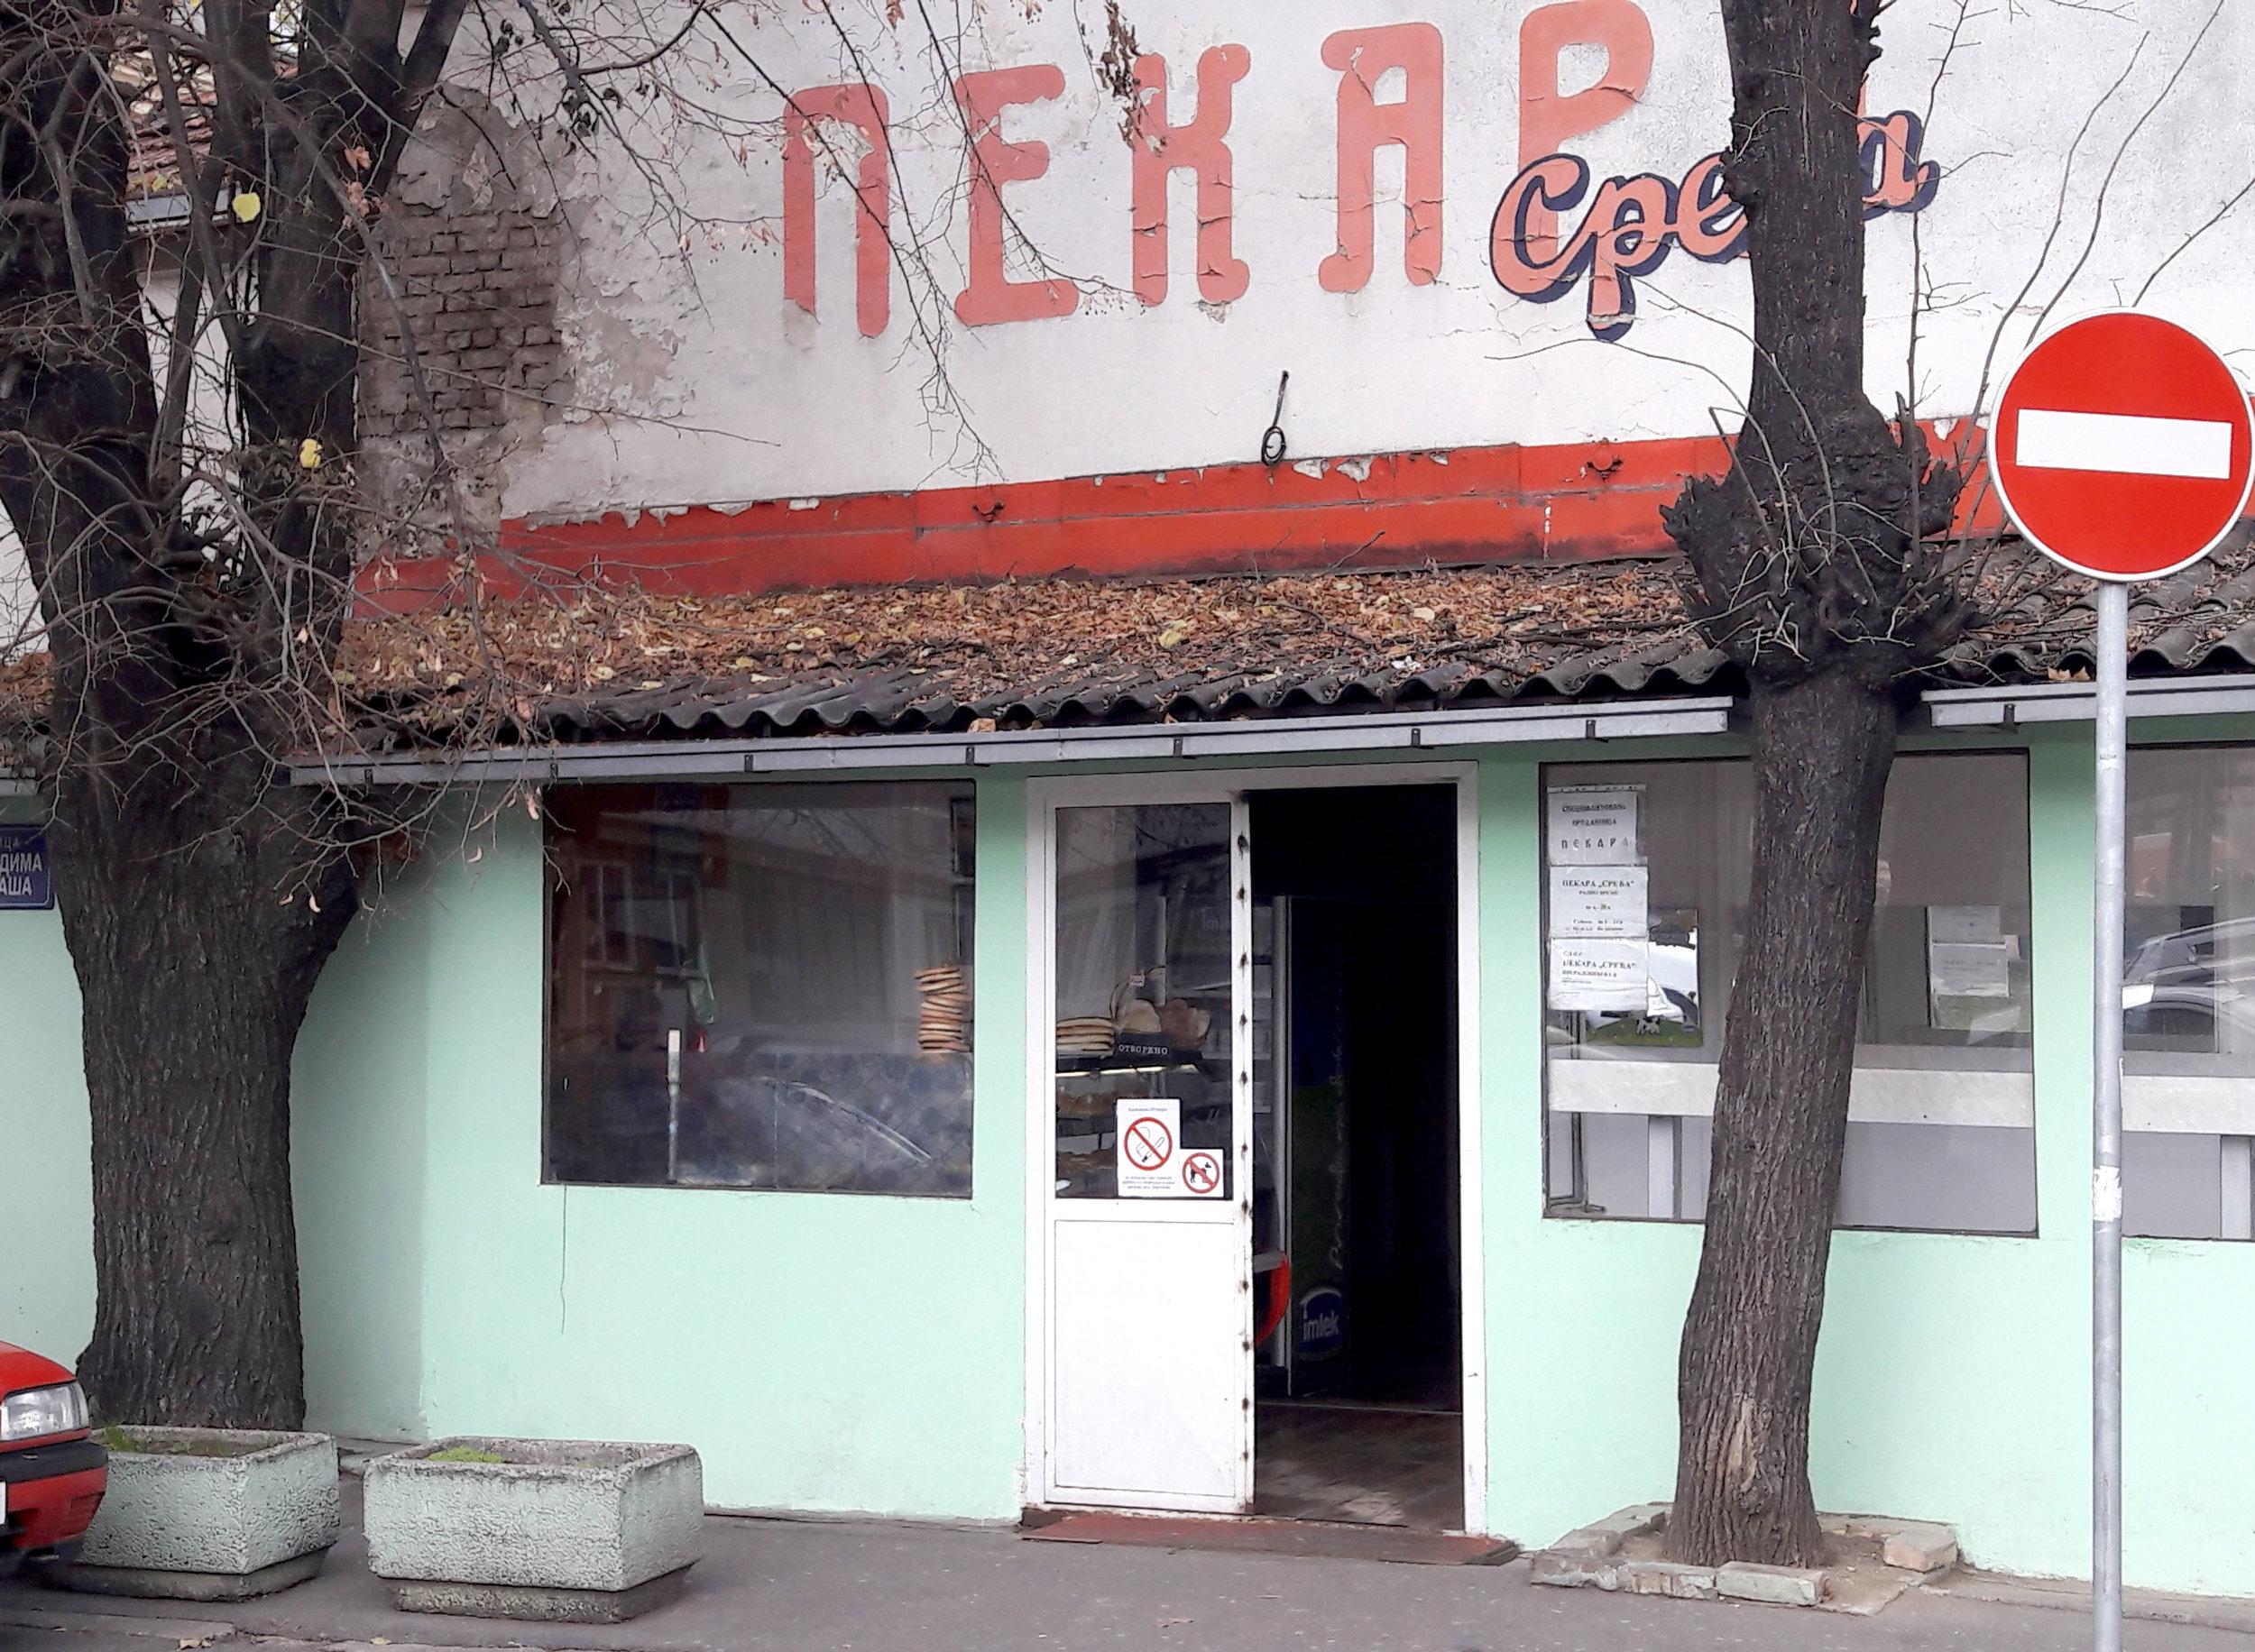 Our local 'Pekara' 'ПЕКАРА'(Bakery) called 'Sreća' (Luck)